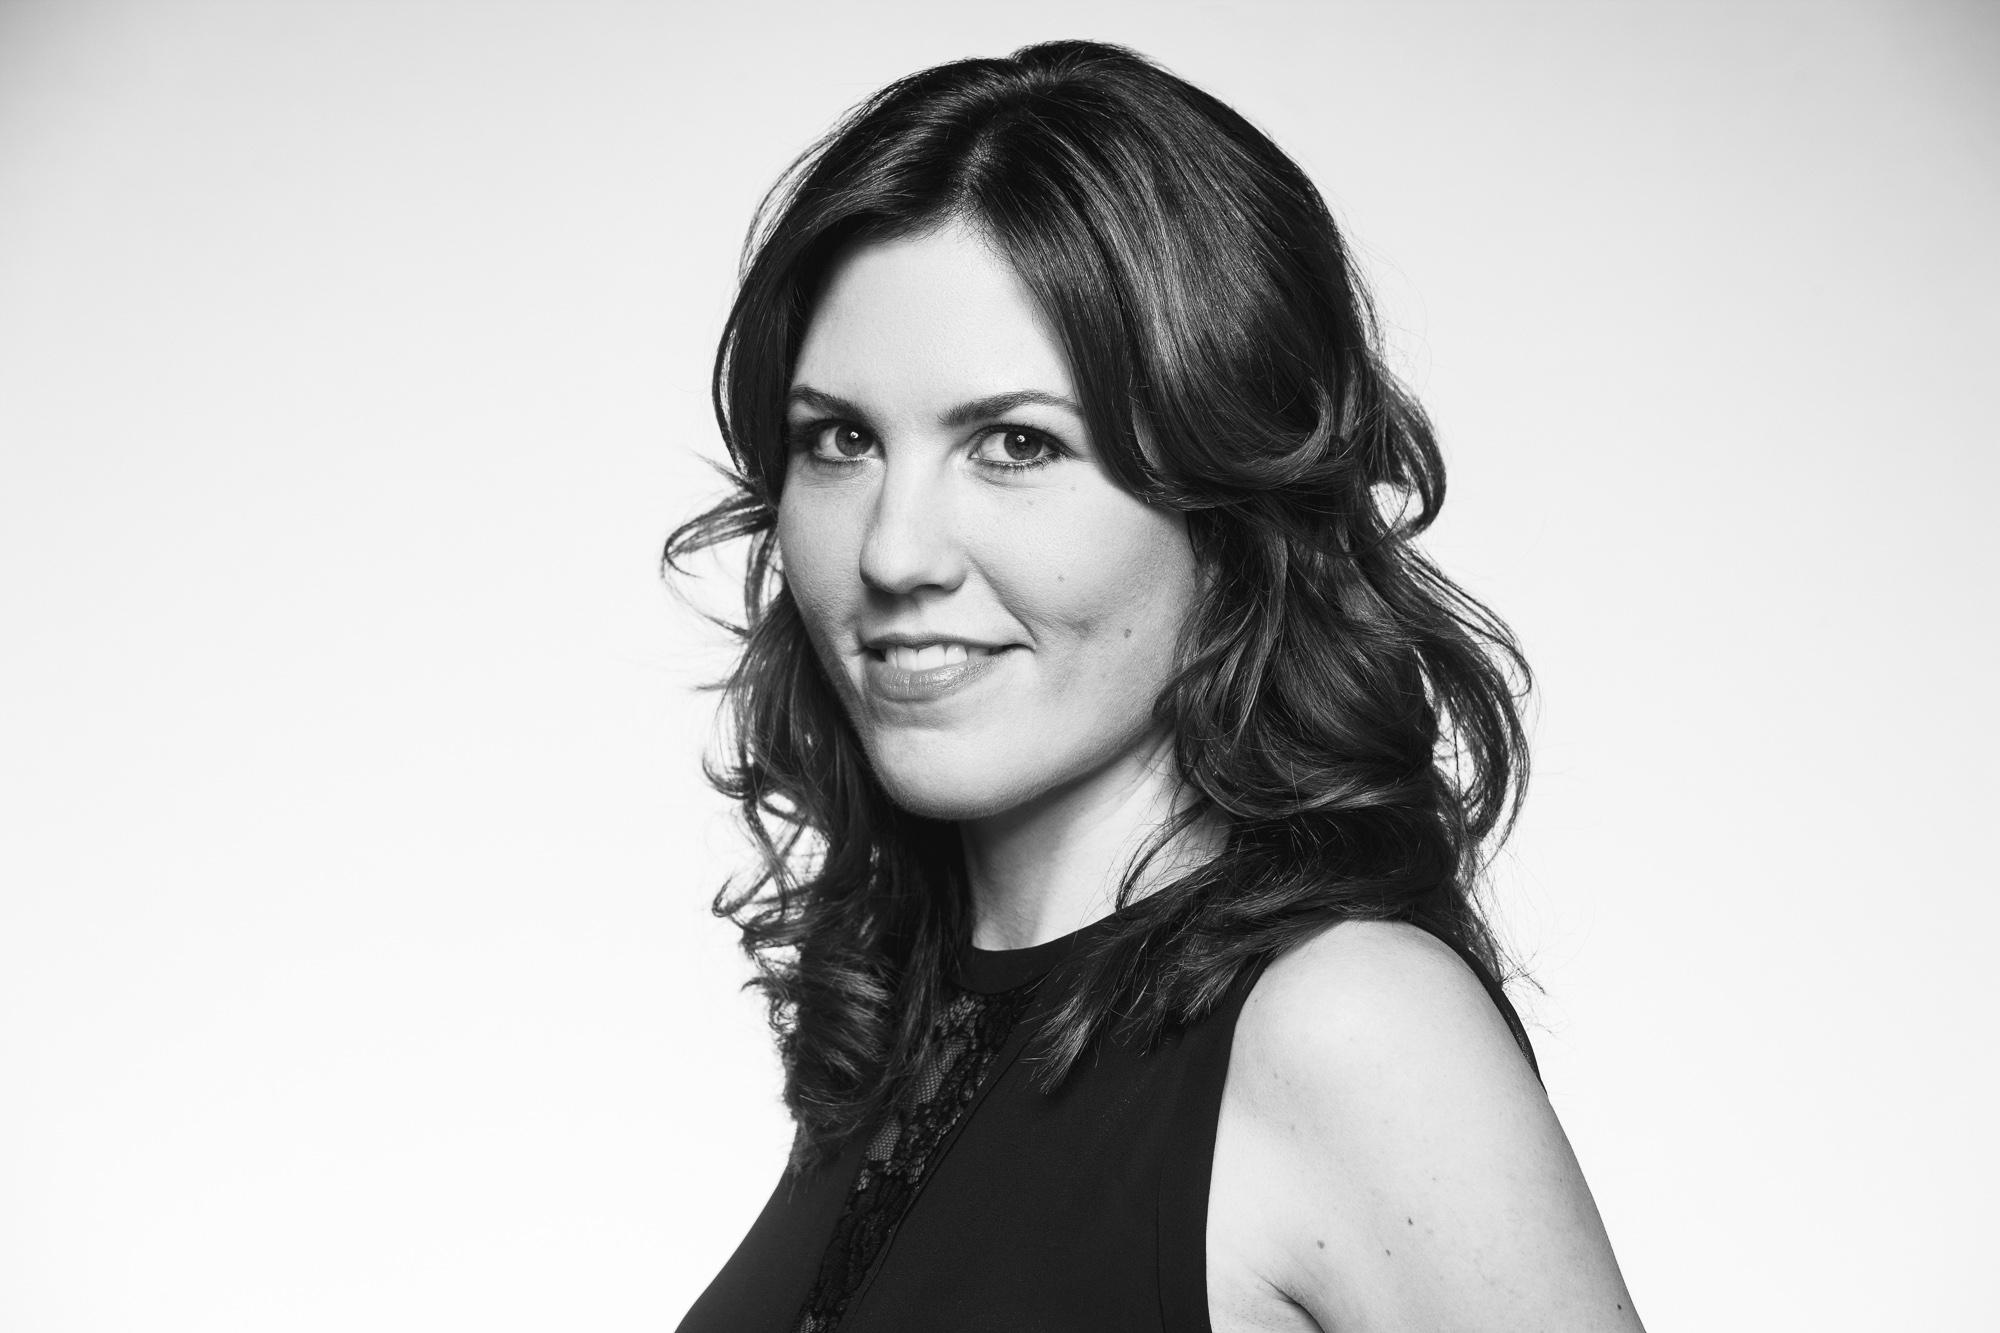 Annika Schilling